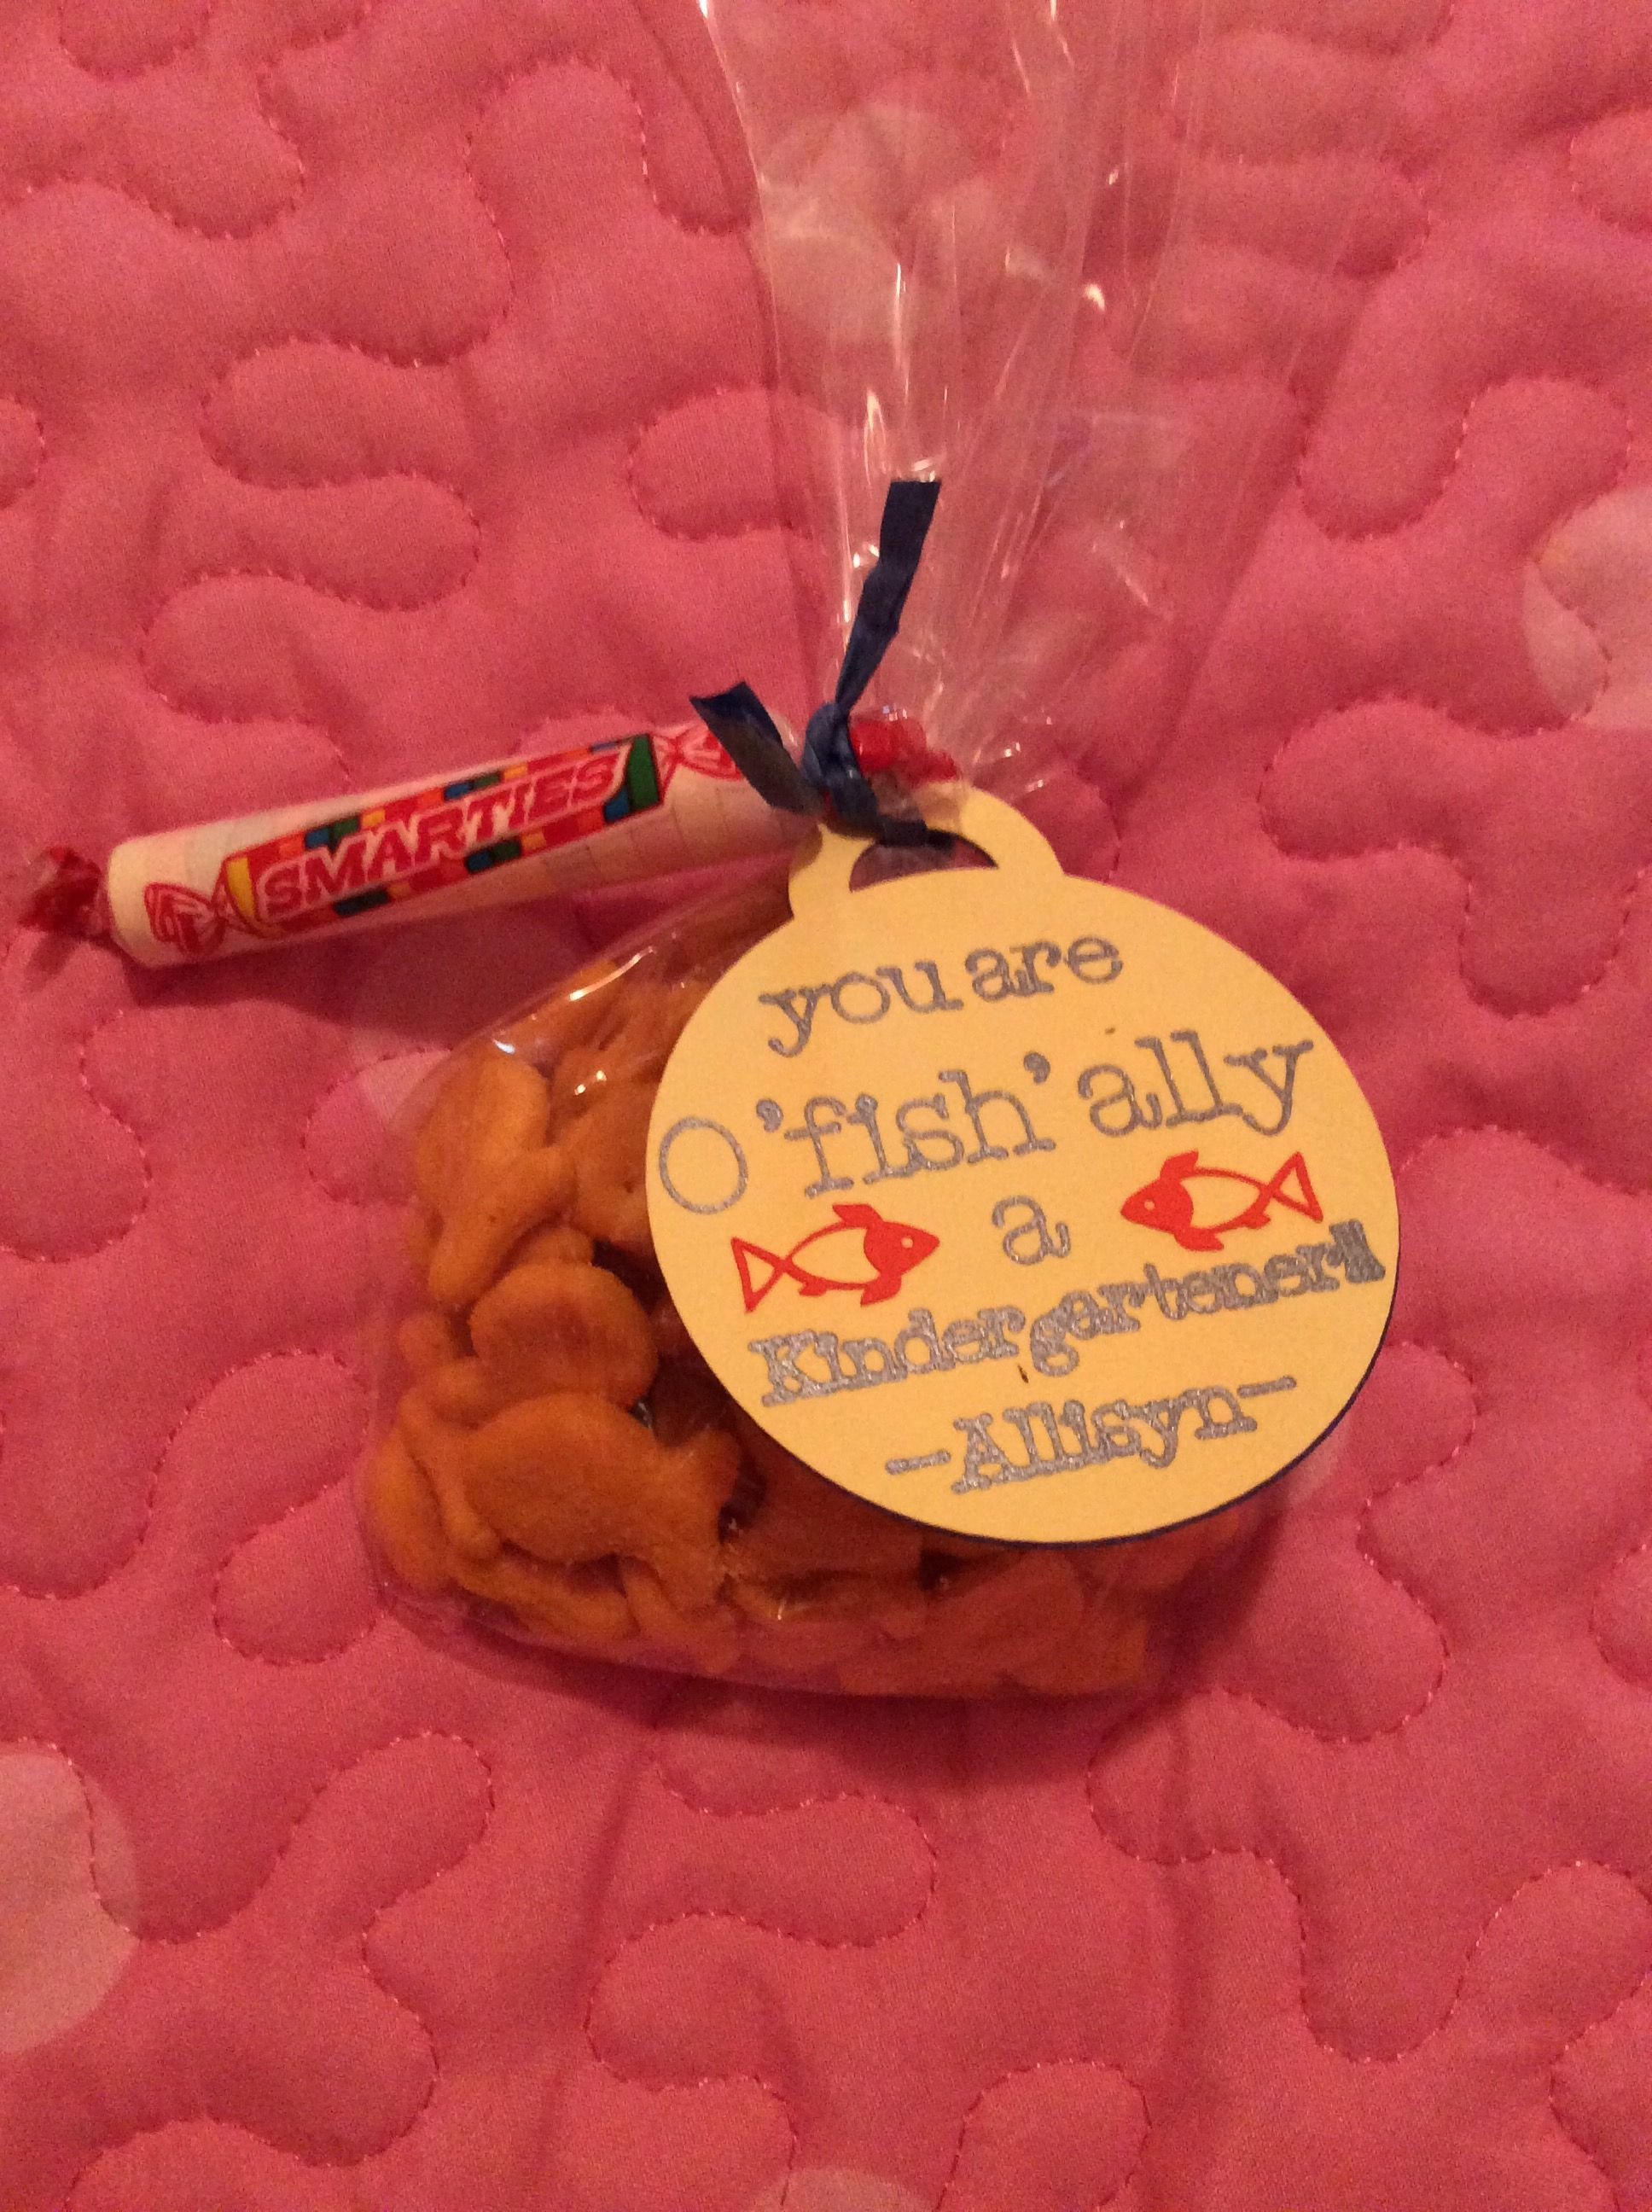 Pin By Kelly Barlow On Kelly Barlow Creations Novelty Christmas Christmas Ornaments Holiday Decor